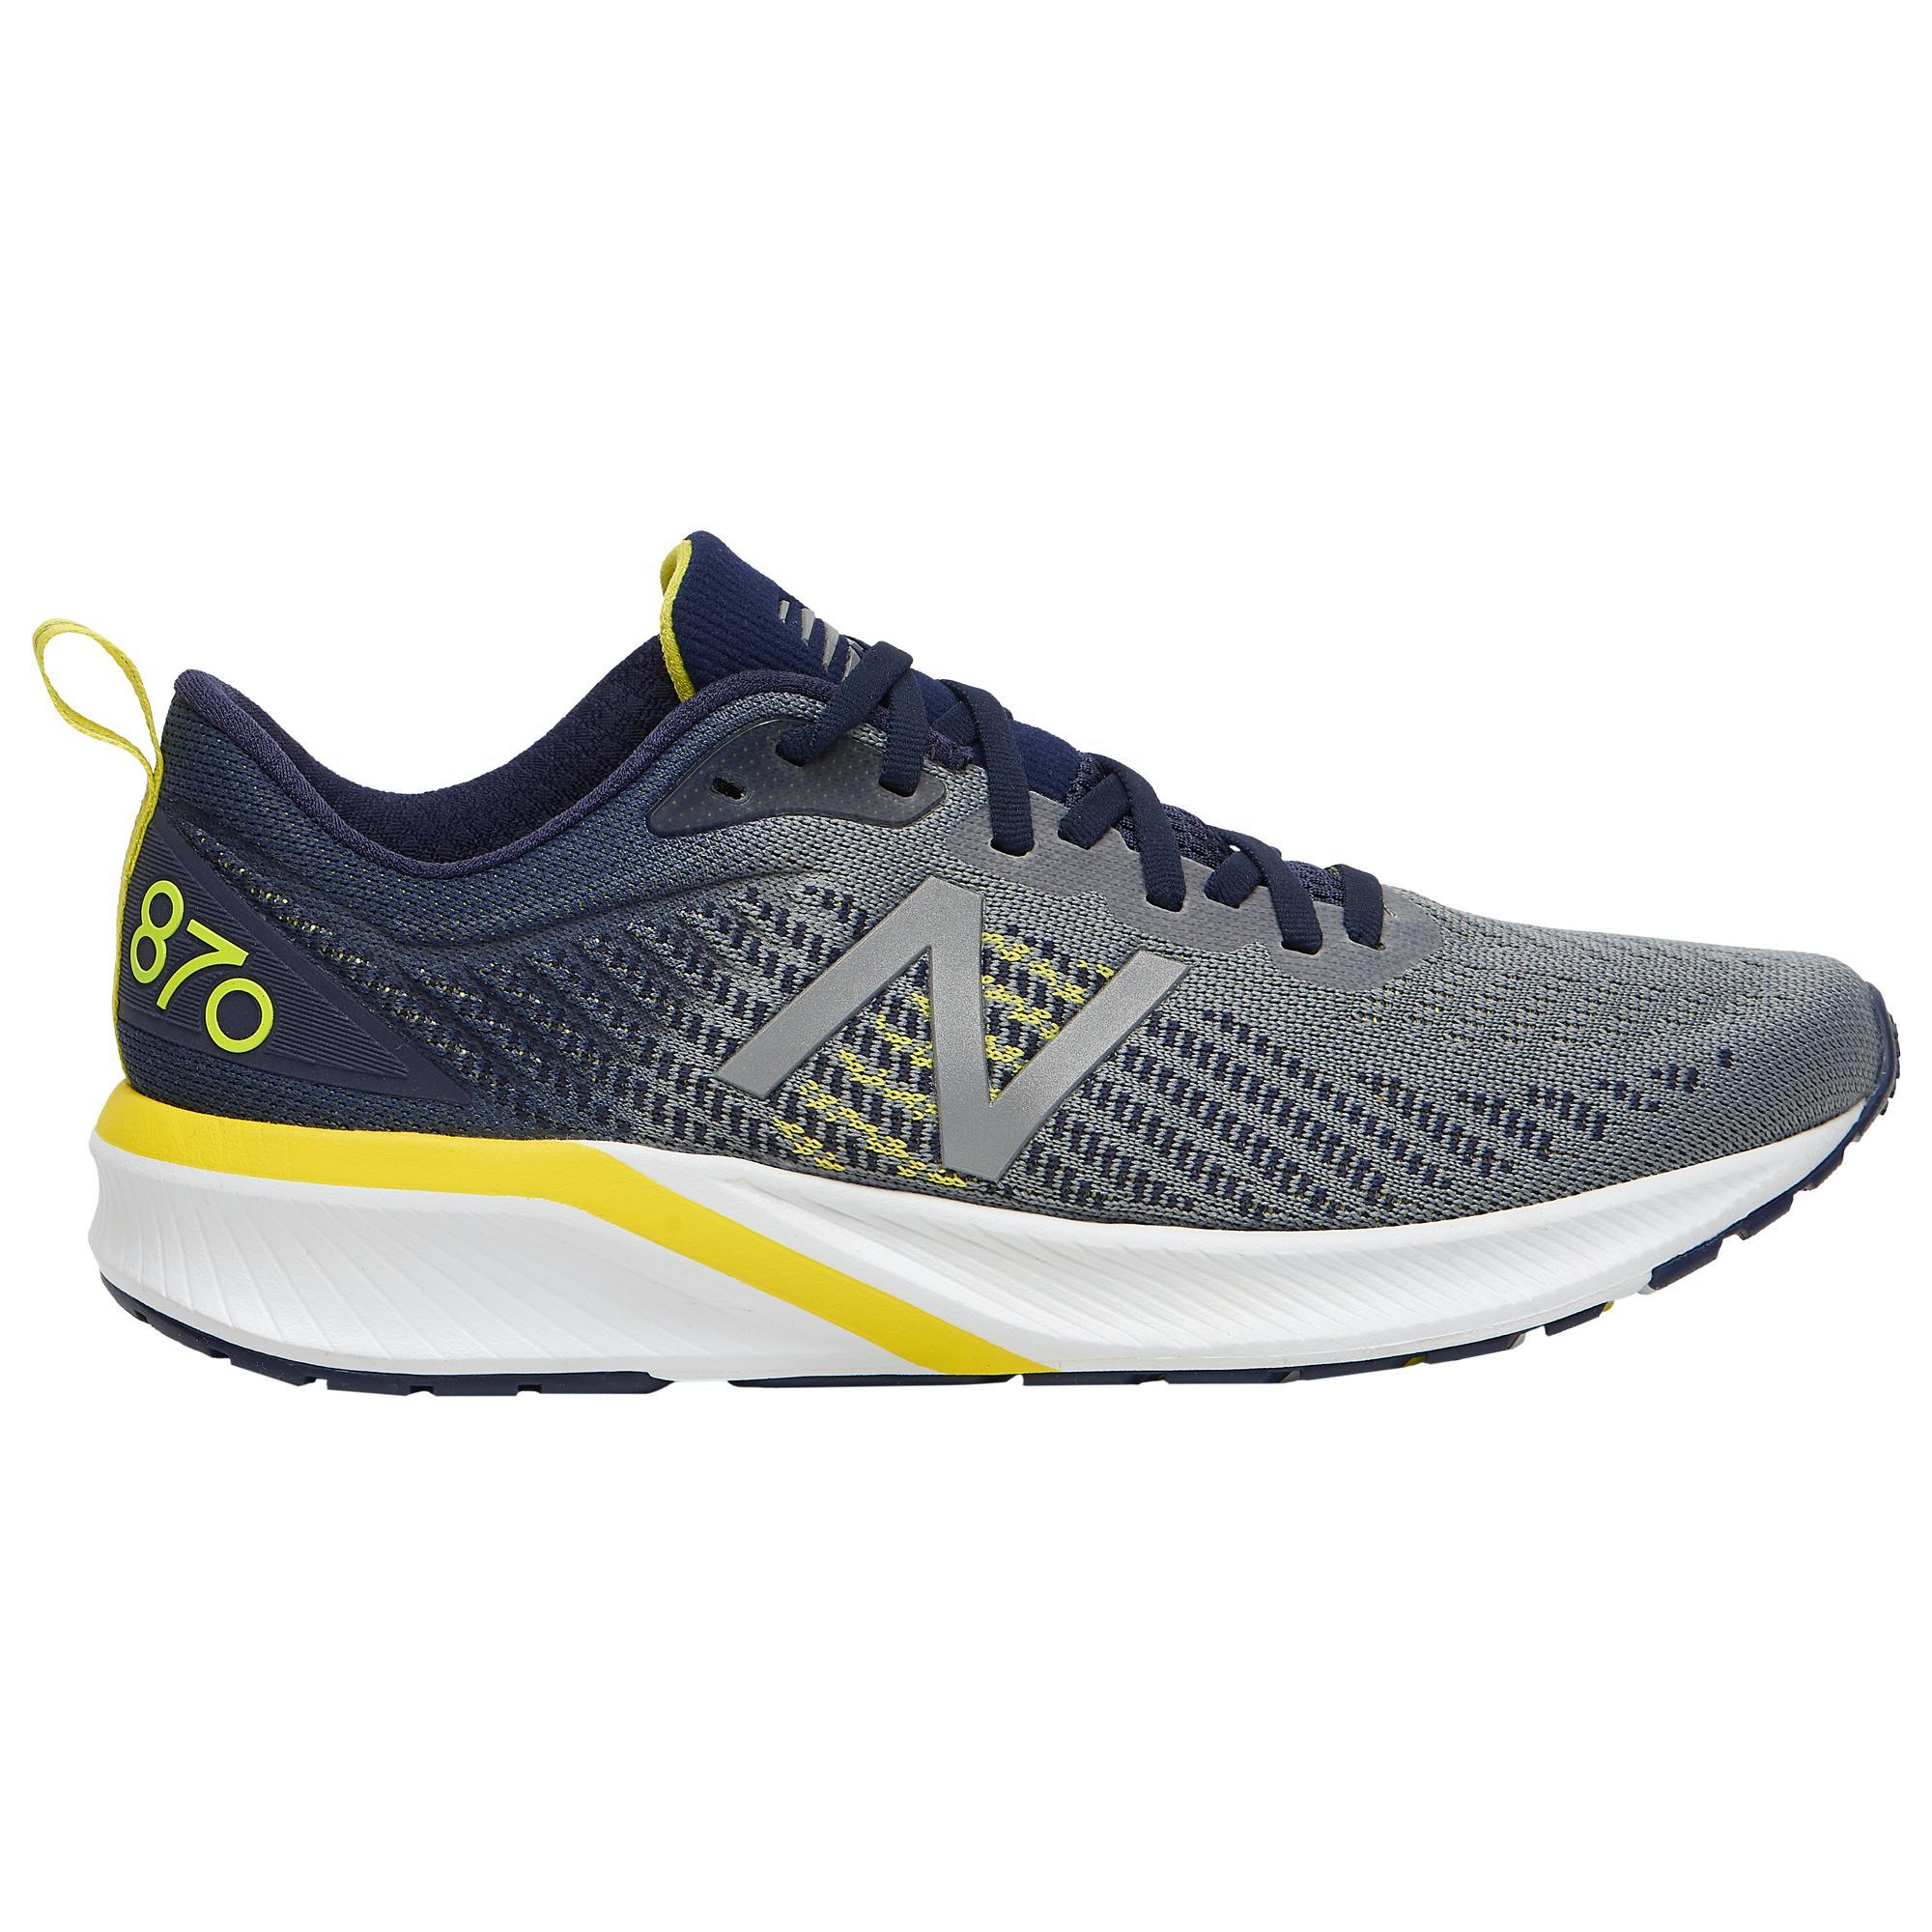 wholesale dealer 88aa0 7c297 Men's Blue 870 V5 Running Shoes